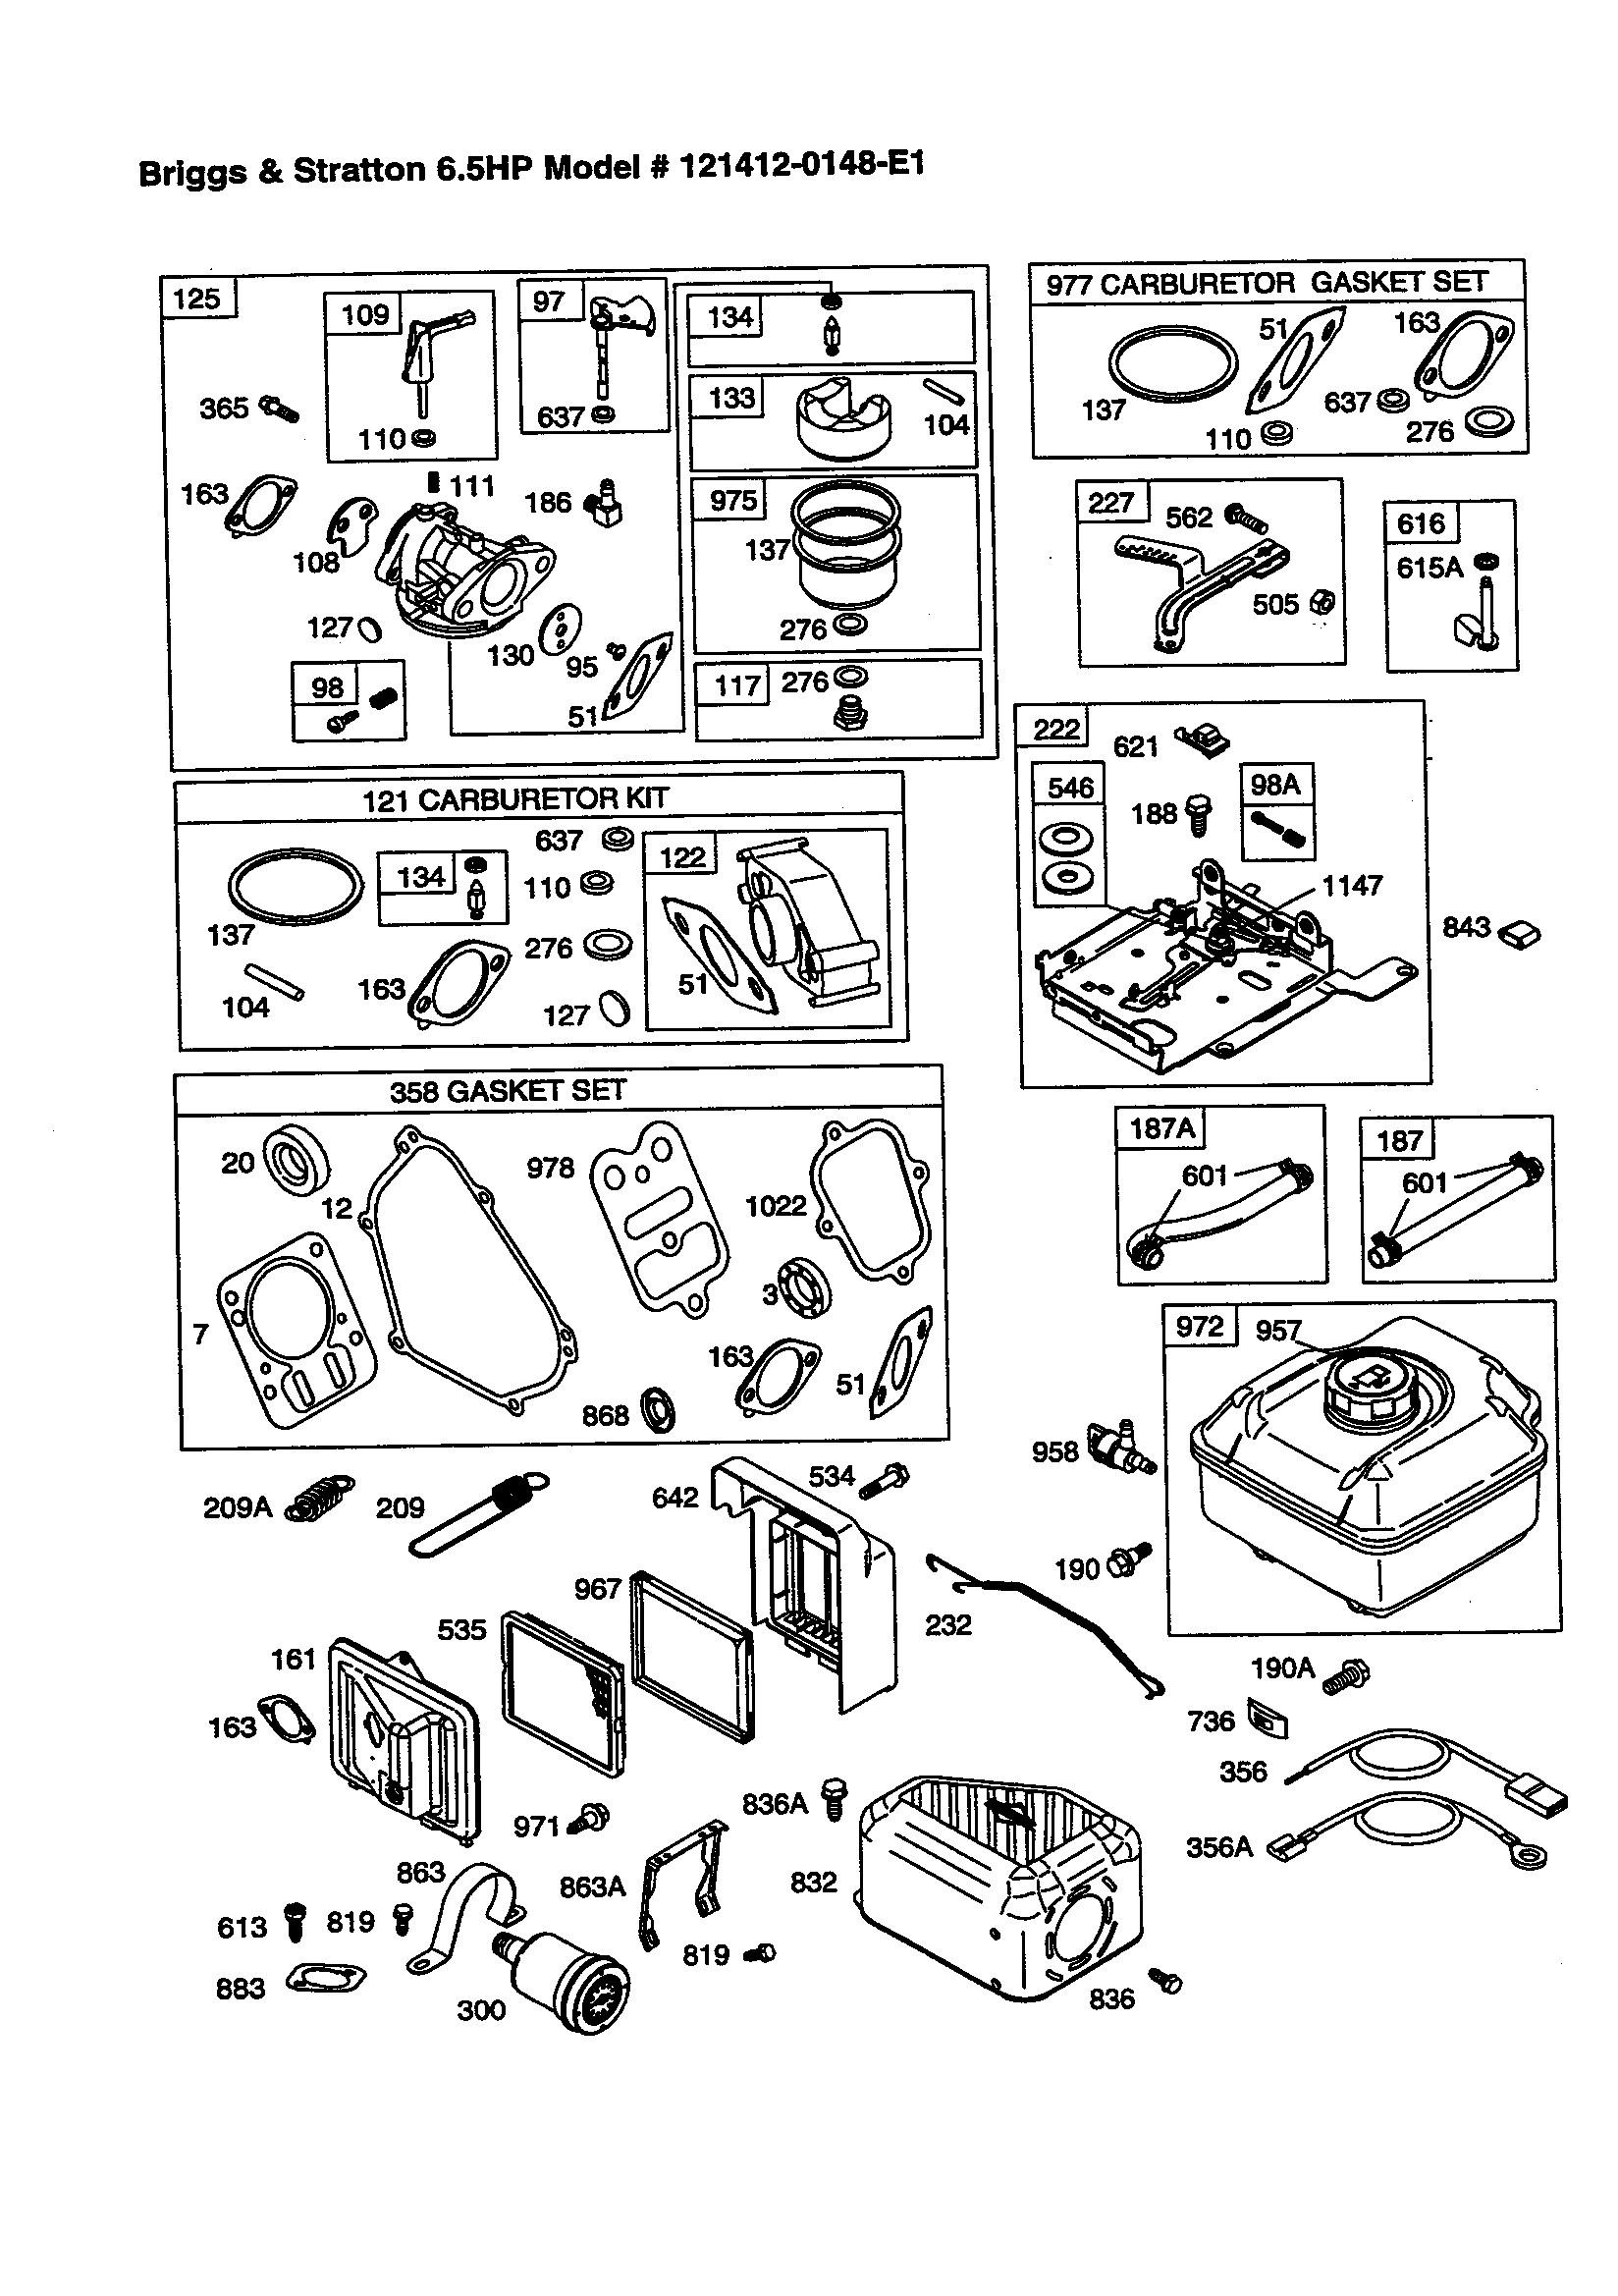 briggs and stratton 17 5 hp engine diagram my wiring diagram rh detoxicrecenze com briggs and stratton 17.5 hp engine carburetor diagram briggs and stratton 17.5 hp engine parts list